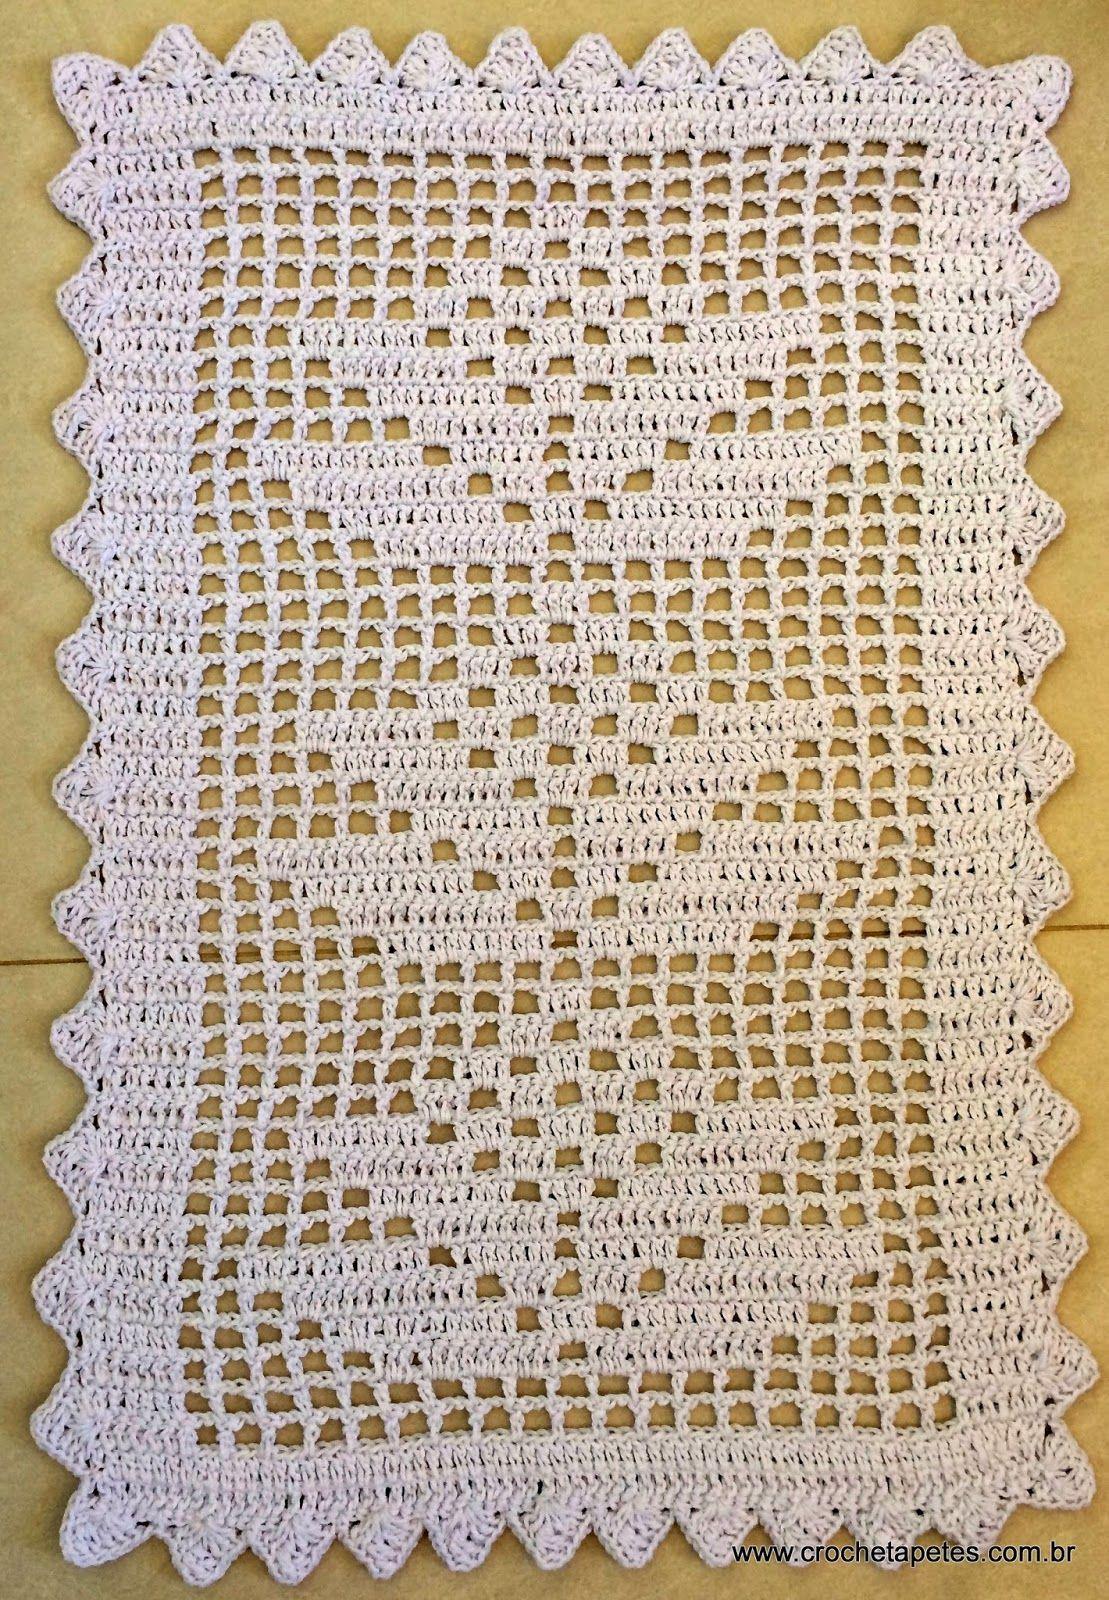 Tapetes em croch encomenda pronta croch tapetes for Tapetes de crochet